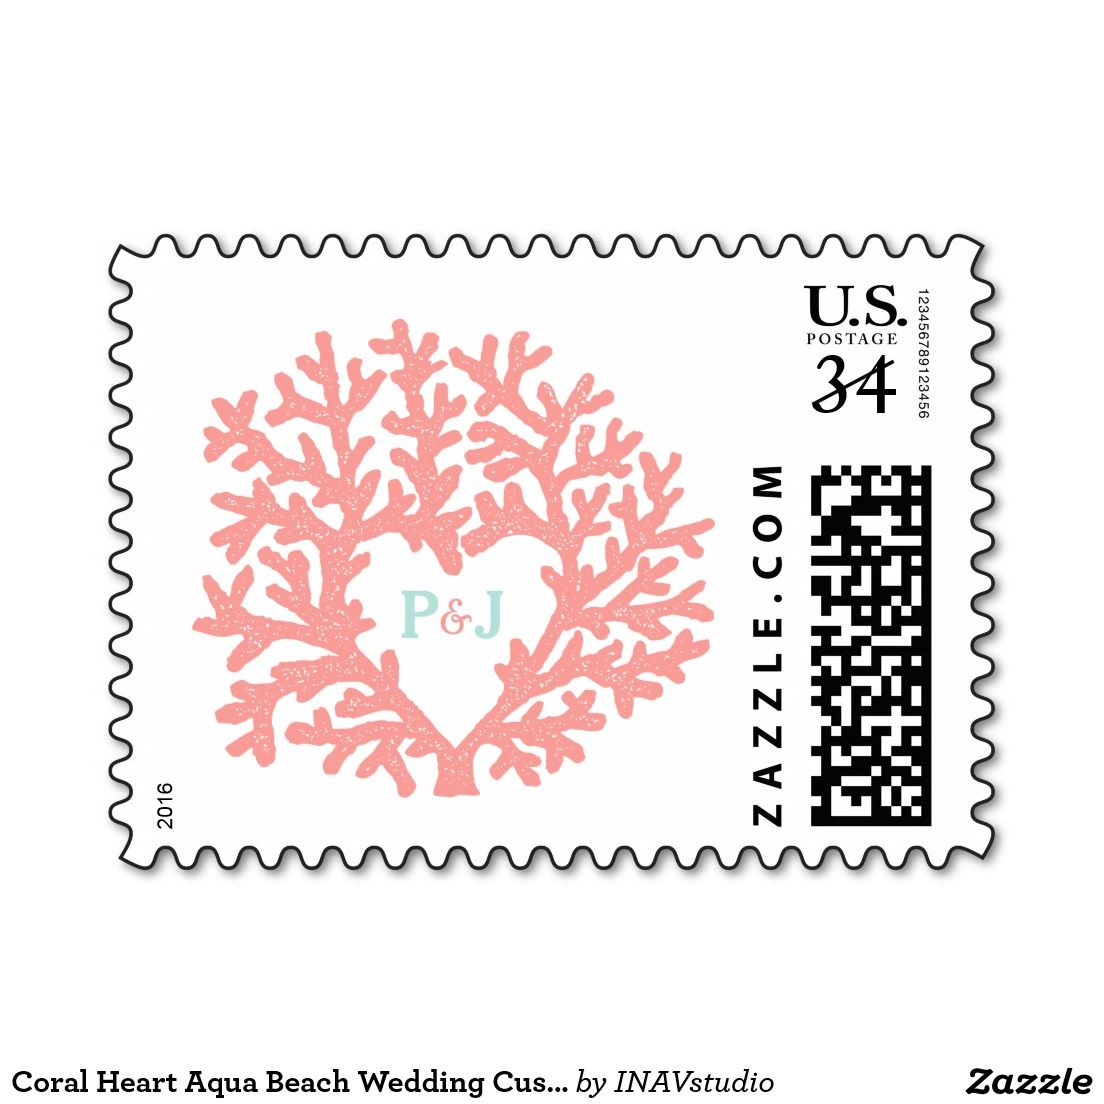 Coral Heart Aqua Beach Wedding Custom Postage | Beach weddings, Aqua ...